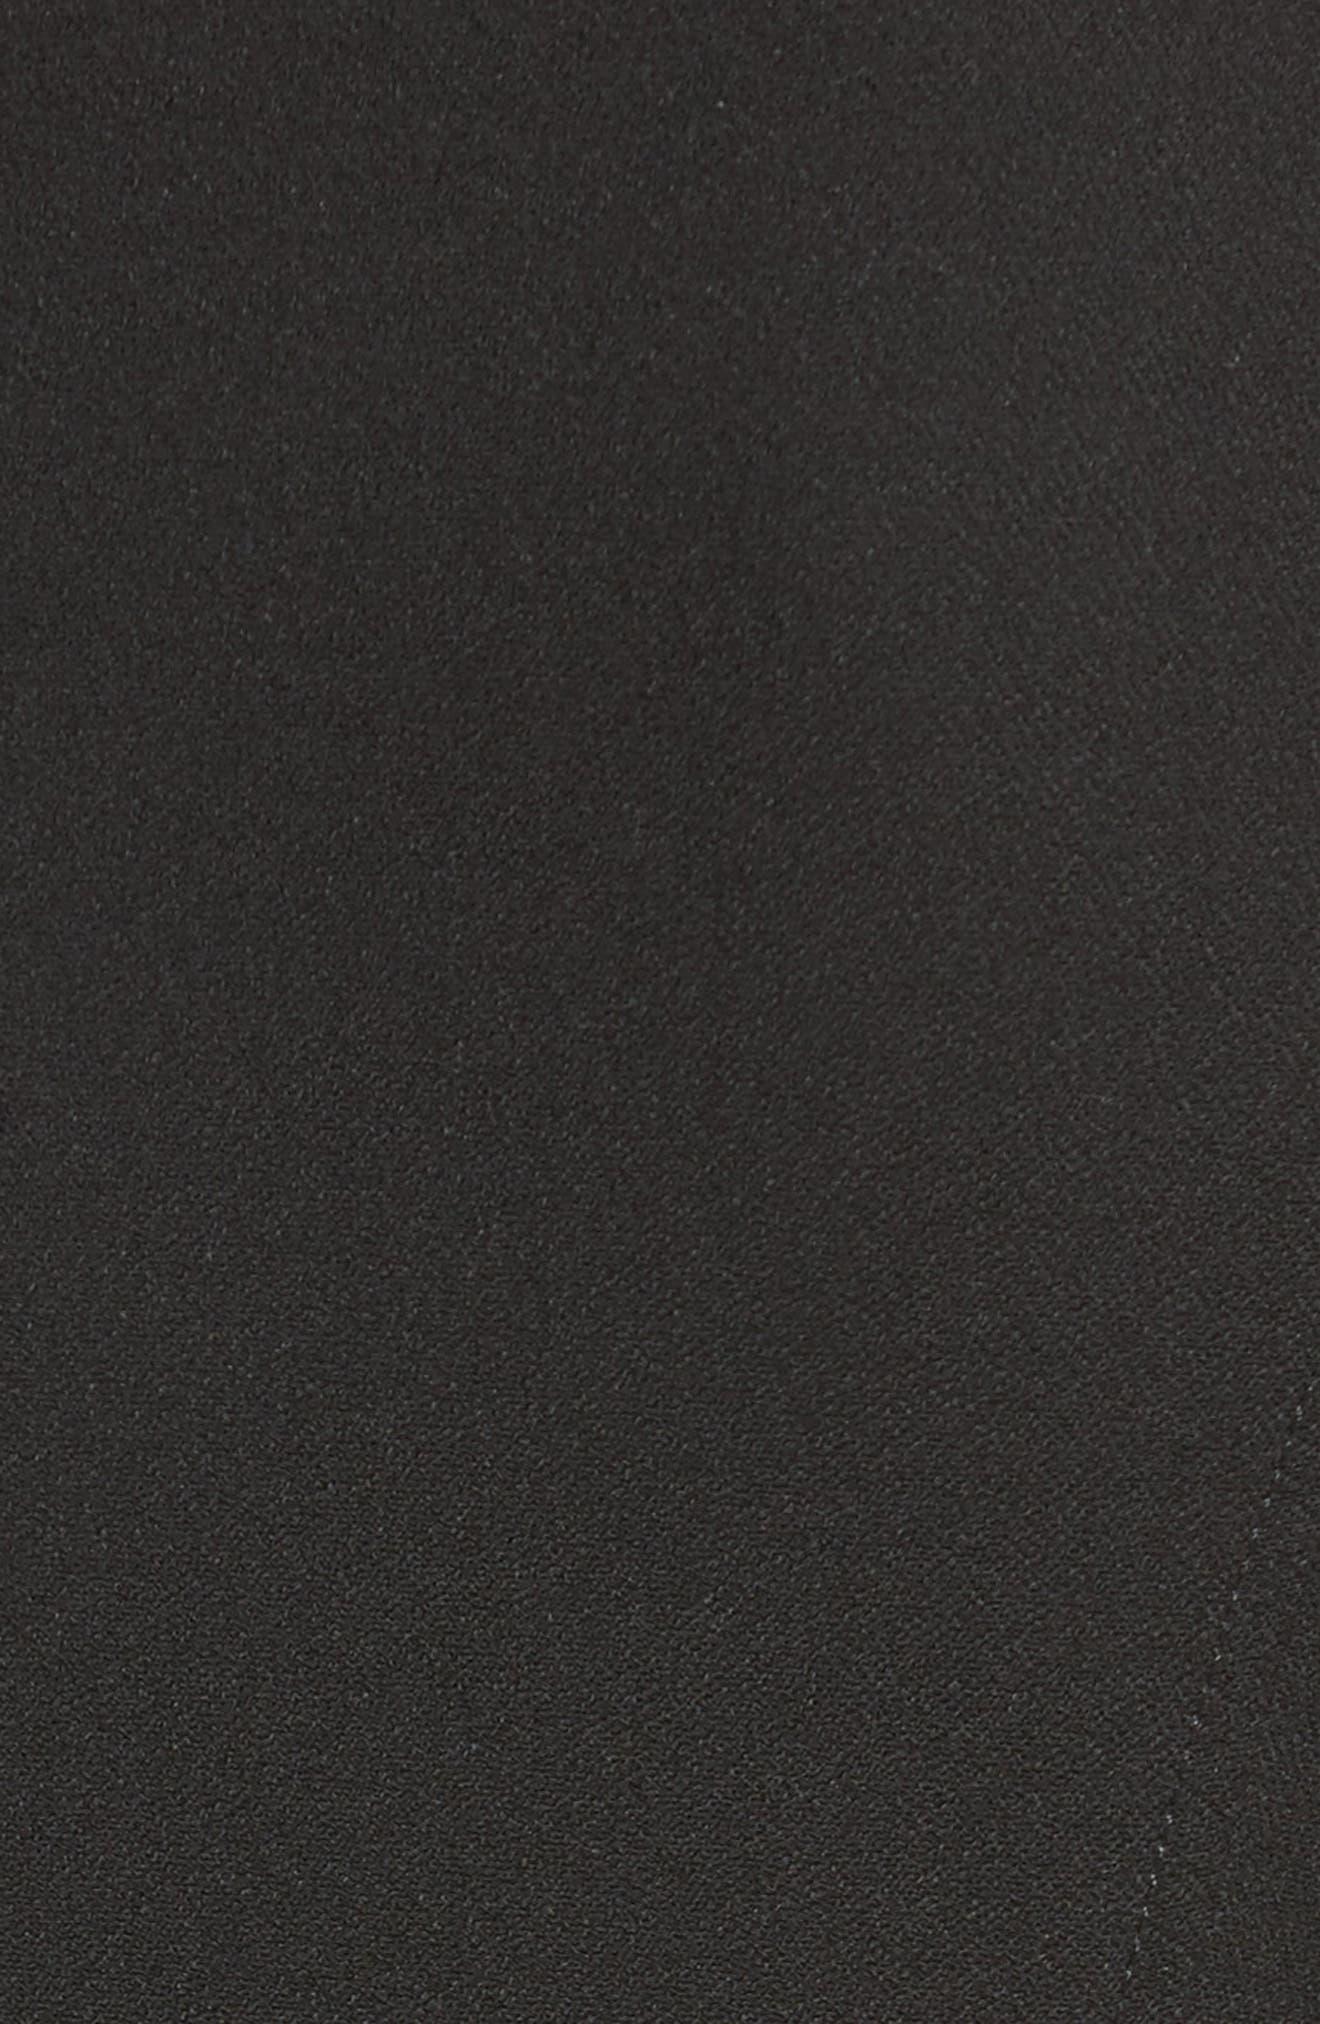 Armani Jeans Crepe Moto Jacket,                             Alternate thumbnail 6, color,                             001